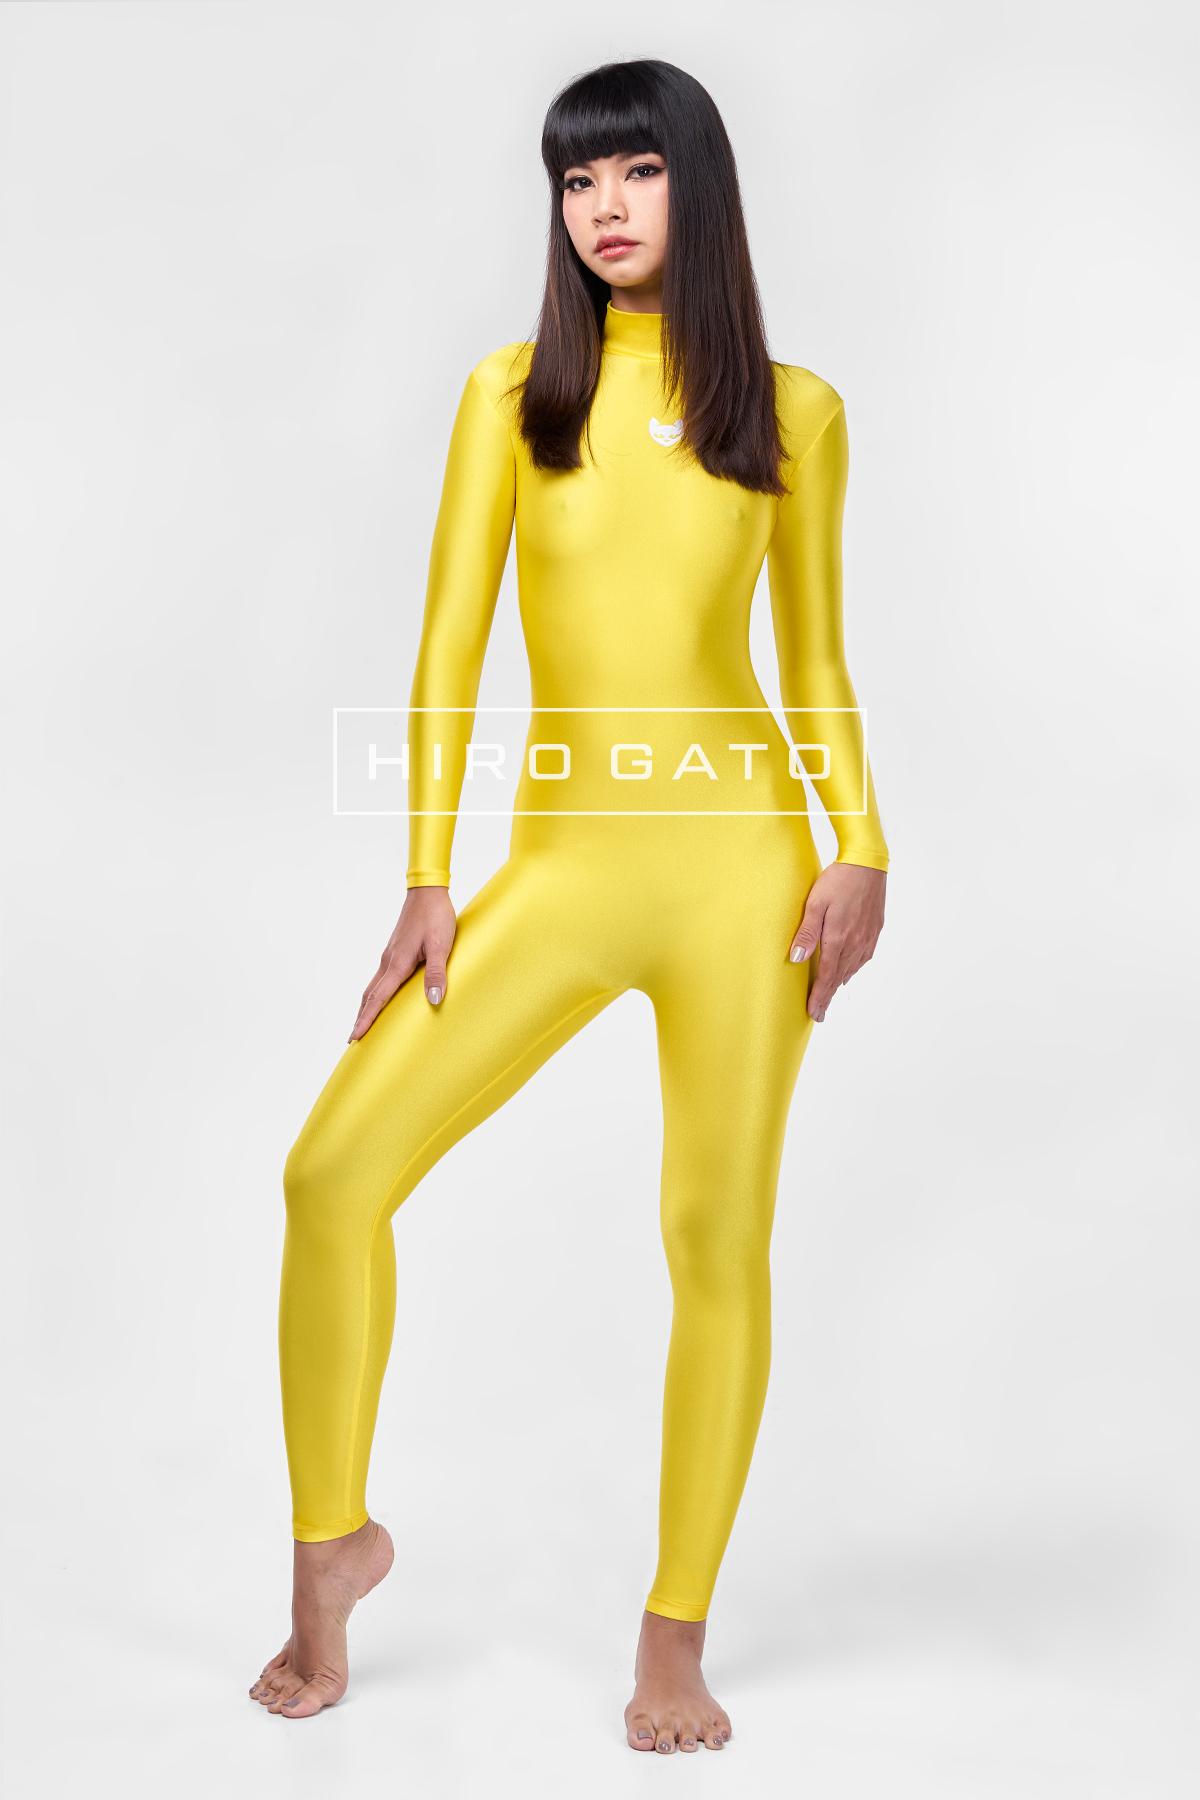 Spandex Catsuit Yellow